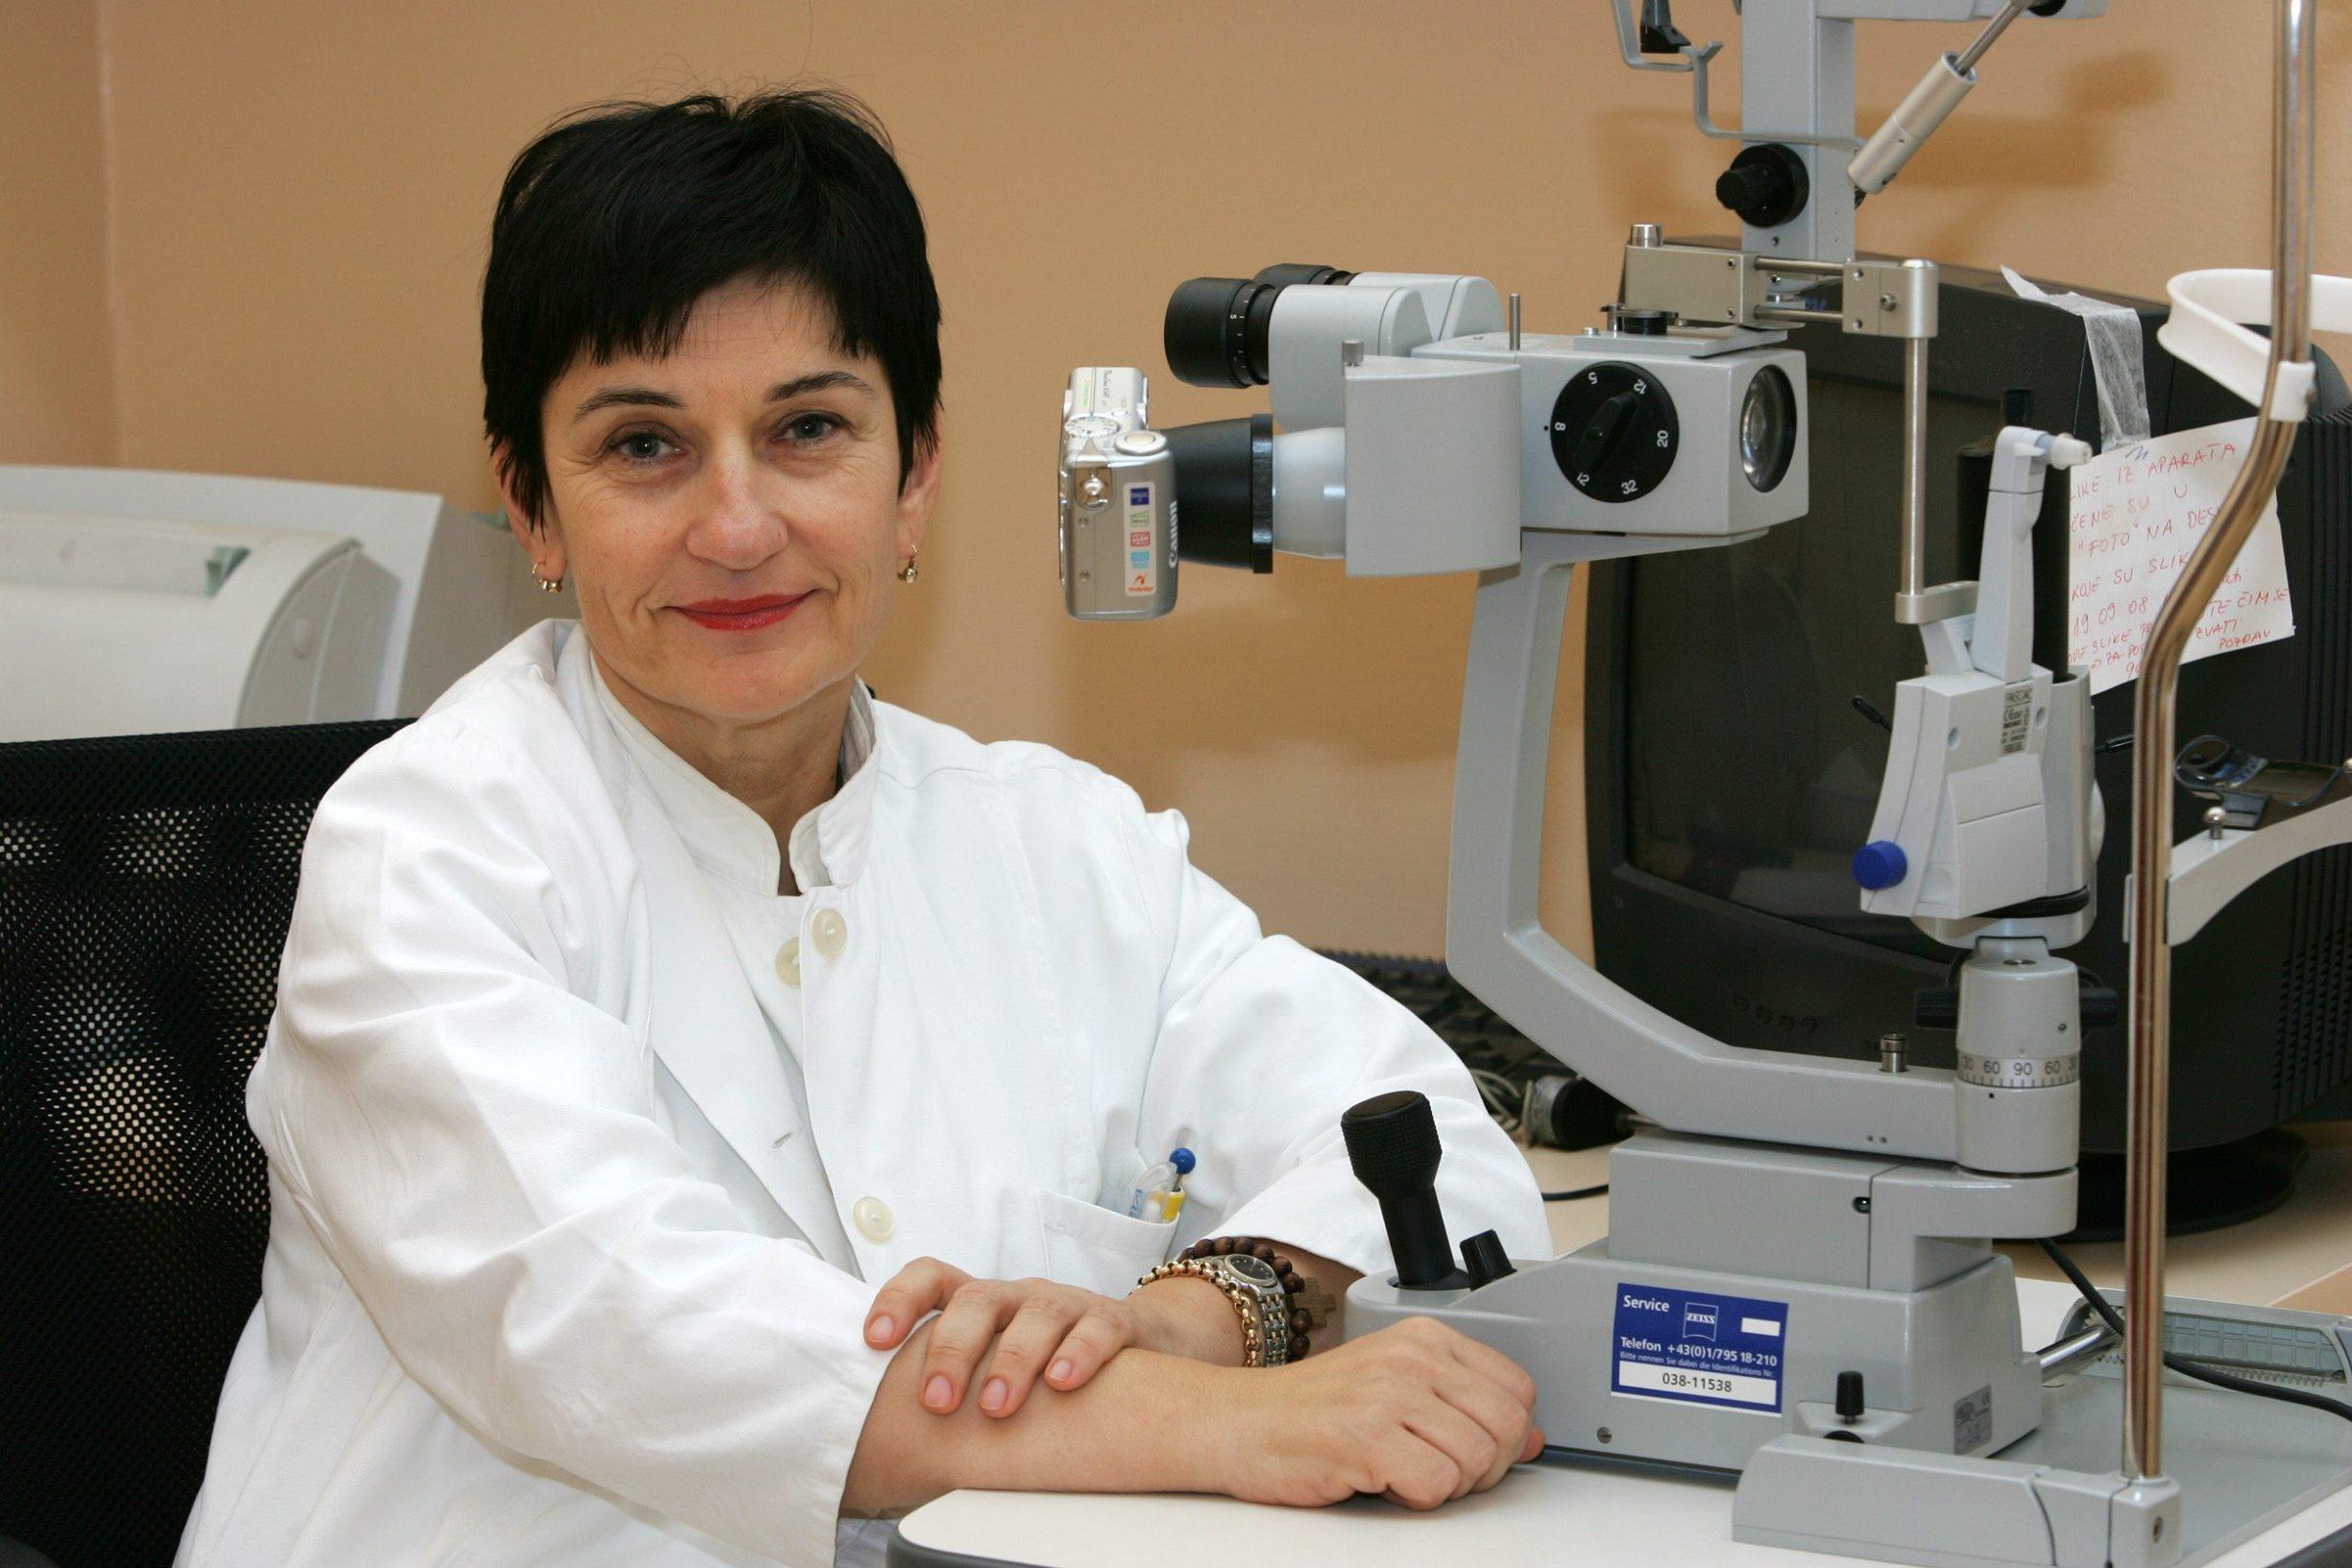 Zagreb, 091208. Katja Novak Lausic, doktor oftamolog na ocnom odjelu bolnice Sestara milosrdnica (Vinogradska). Foto: Davor Pongracic / Cropix